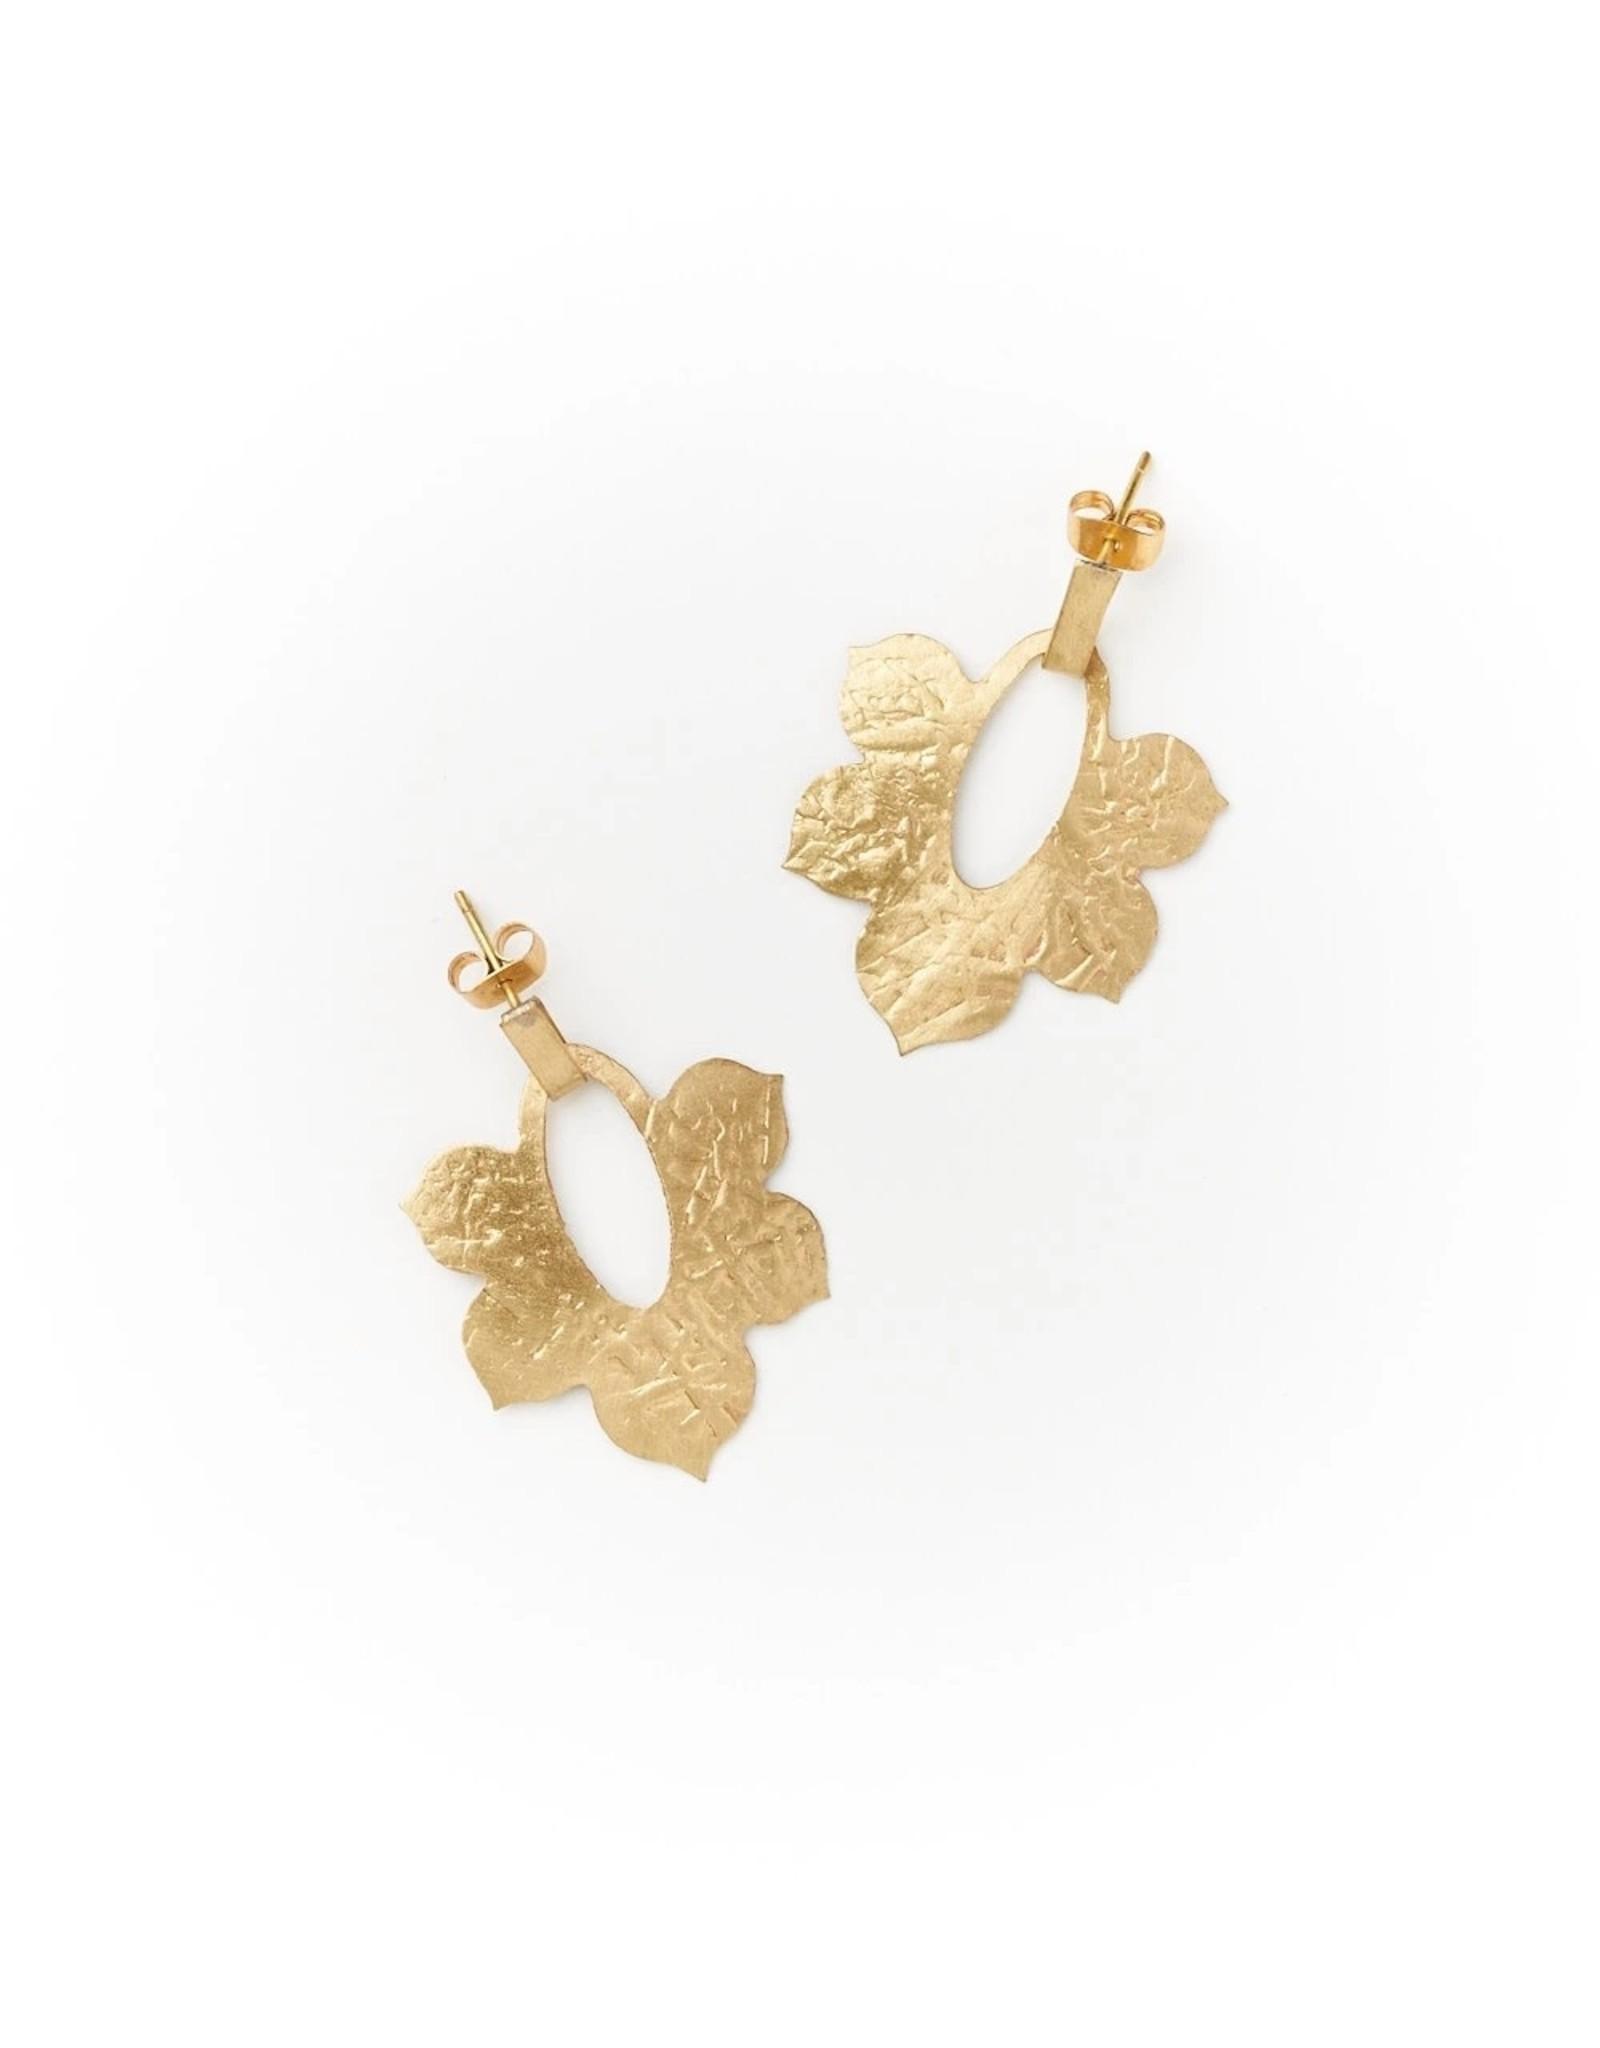 Matr Boomie Kalyani earrings- stud, India